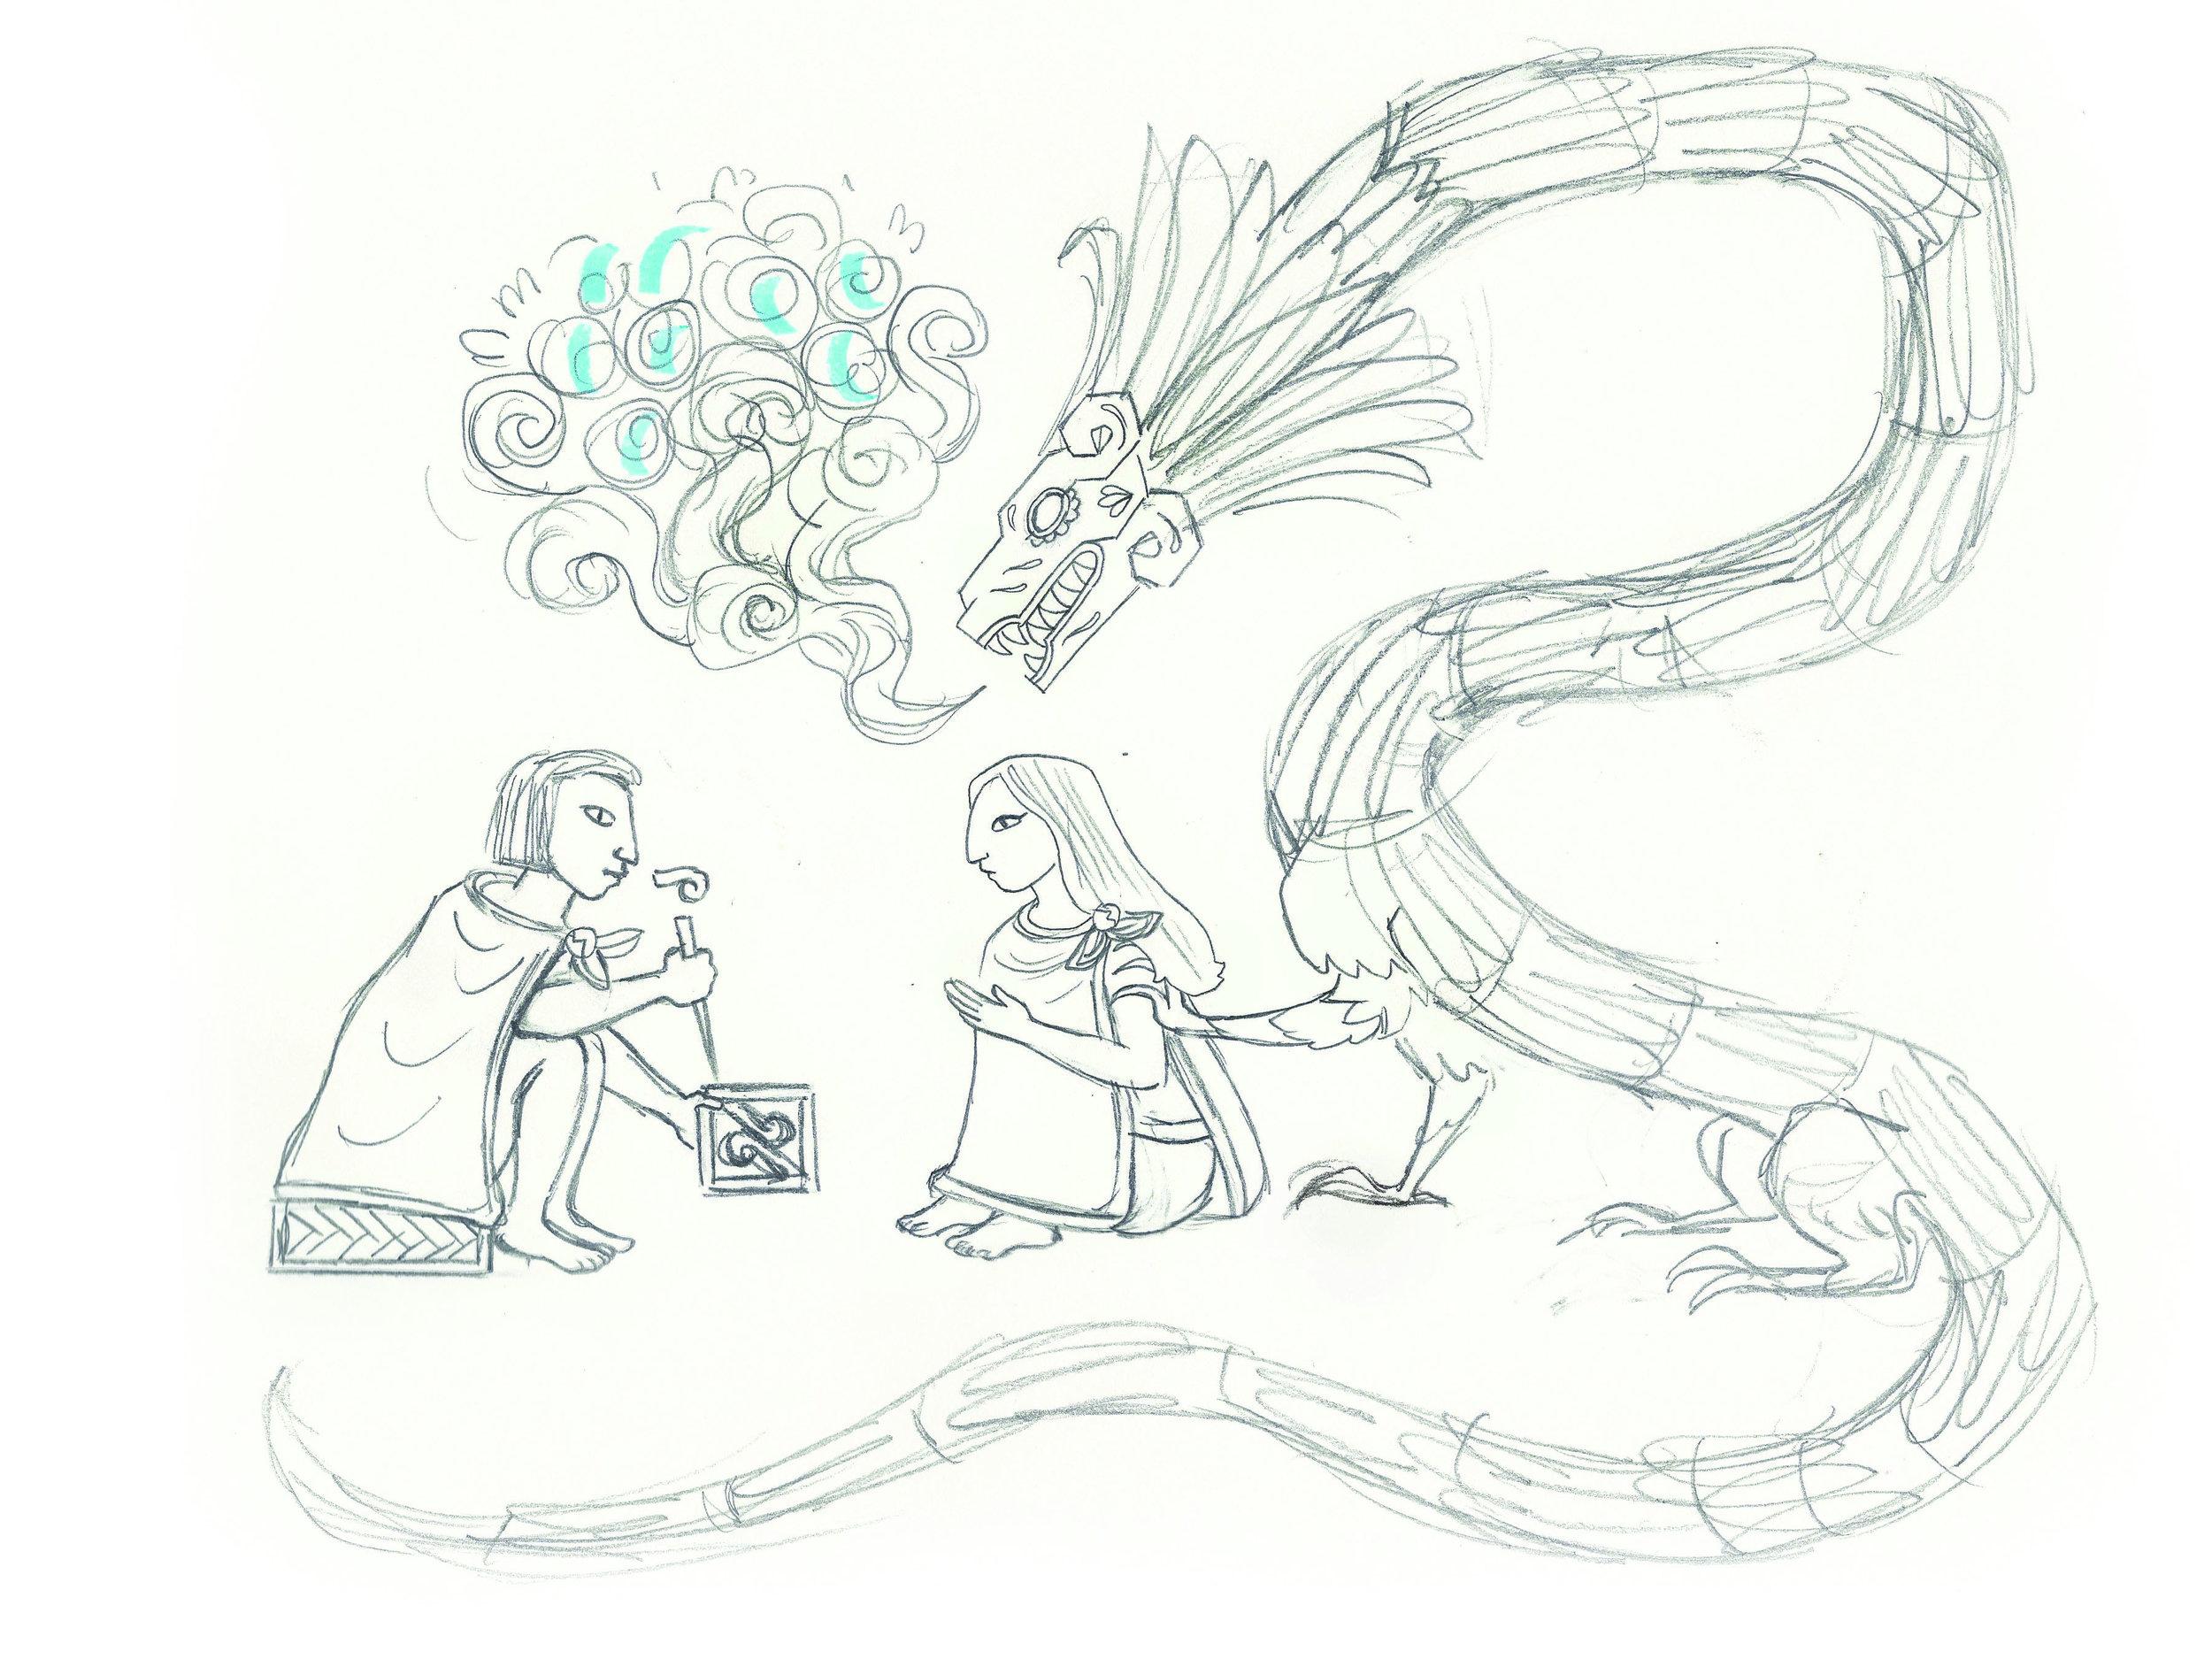 Quetzal_Sketch_2.jpg